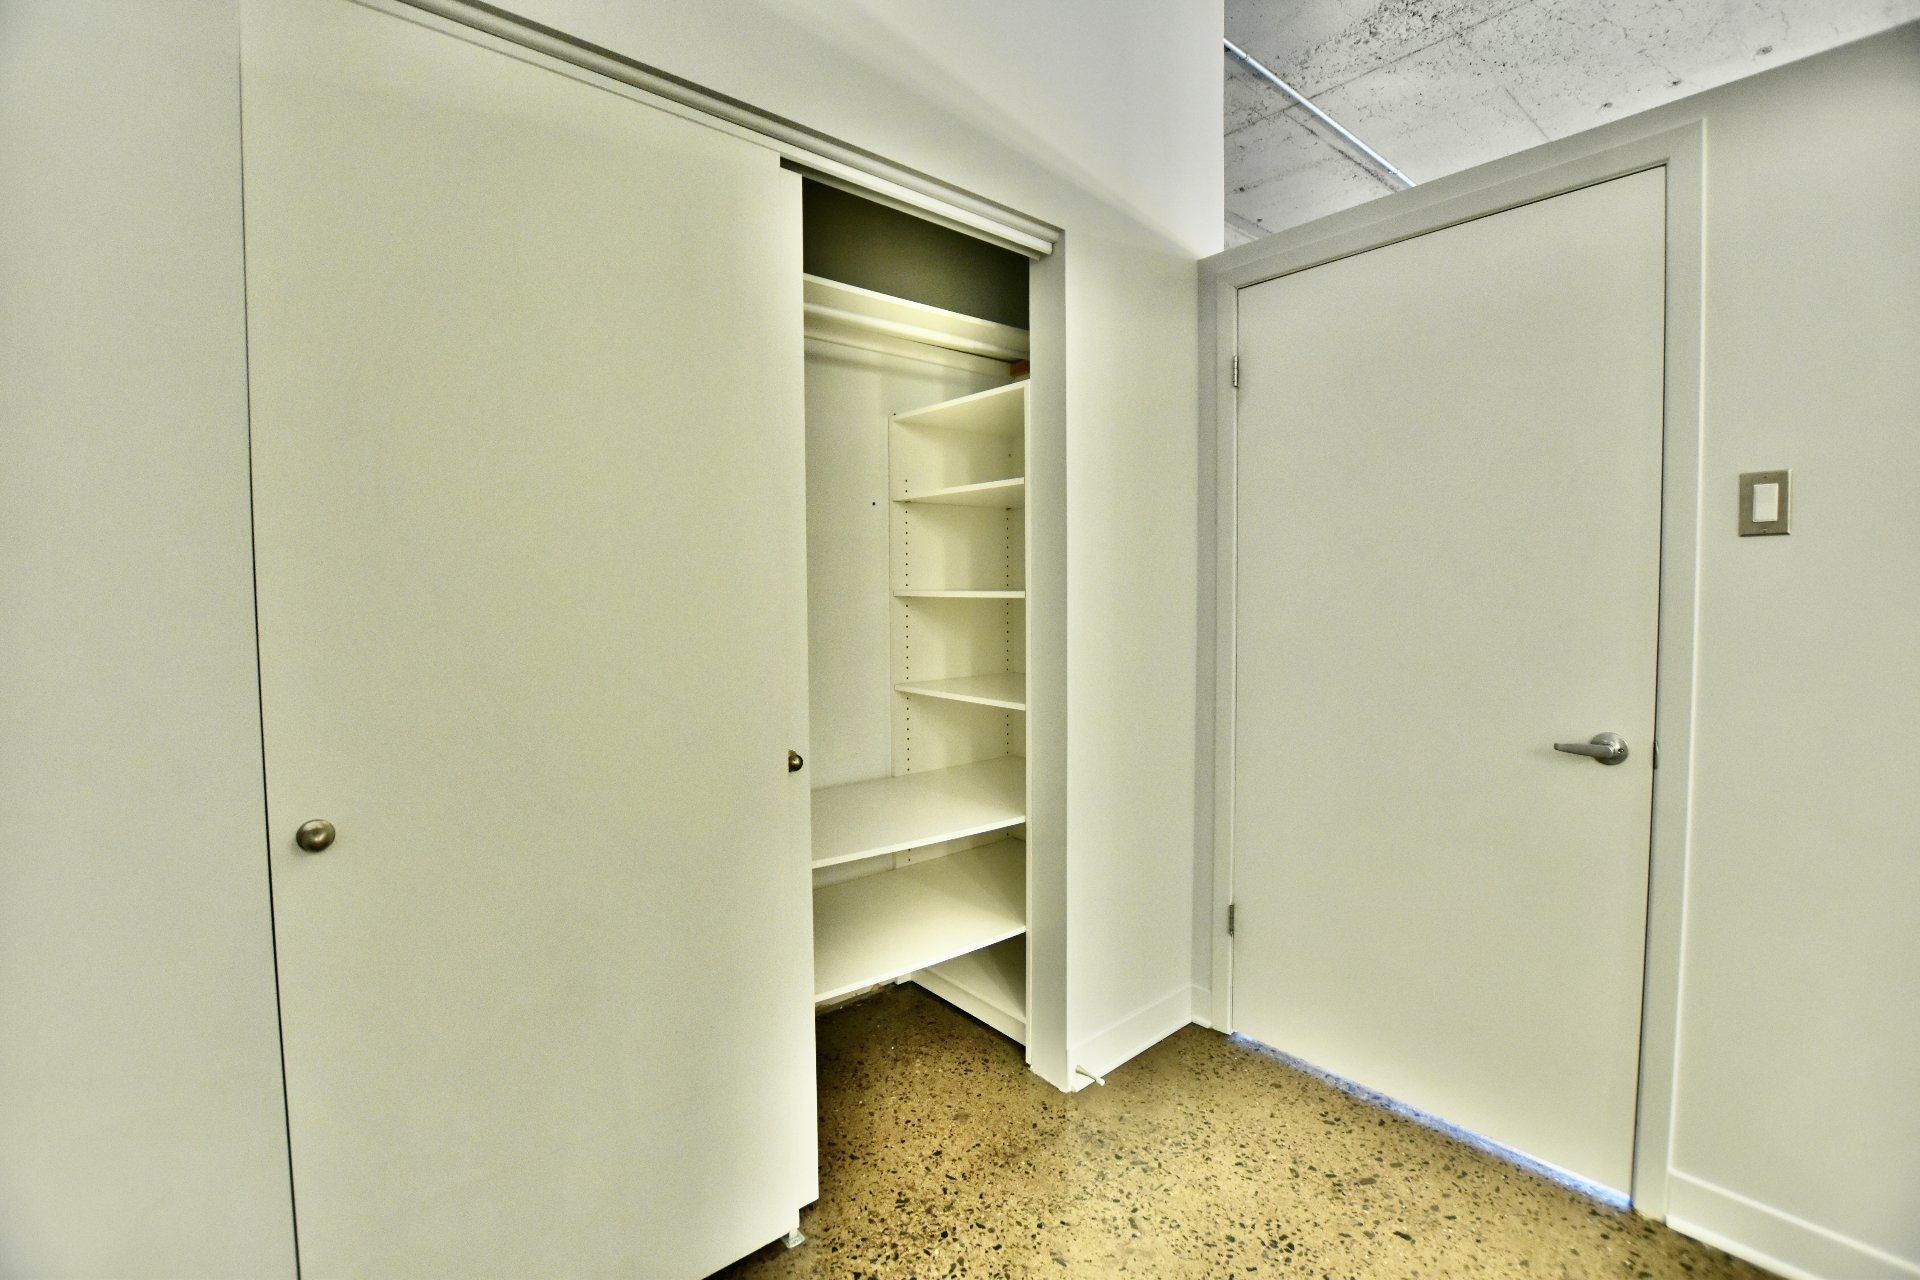 image 23 - Departamento Para alquiler Villeray/Saint-Michel/Parc-Extension Montréal  - 5 habitaciones